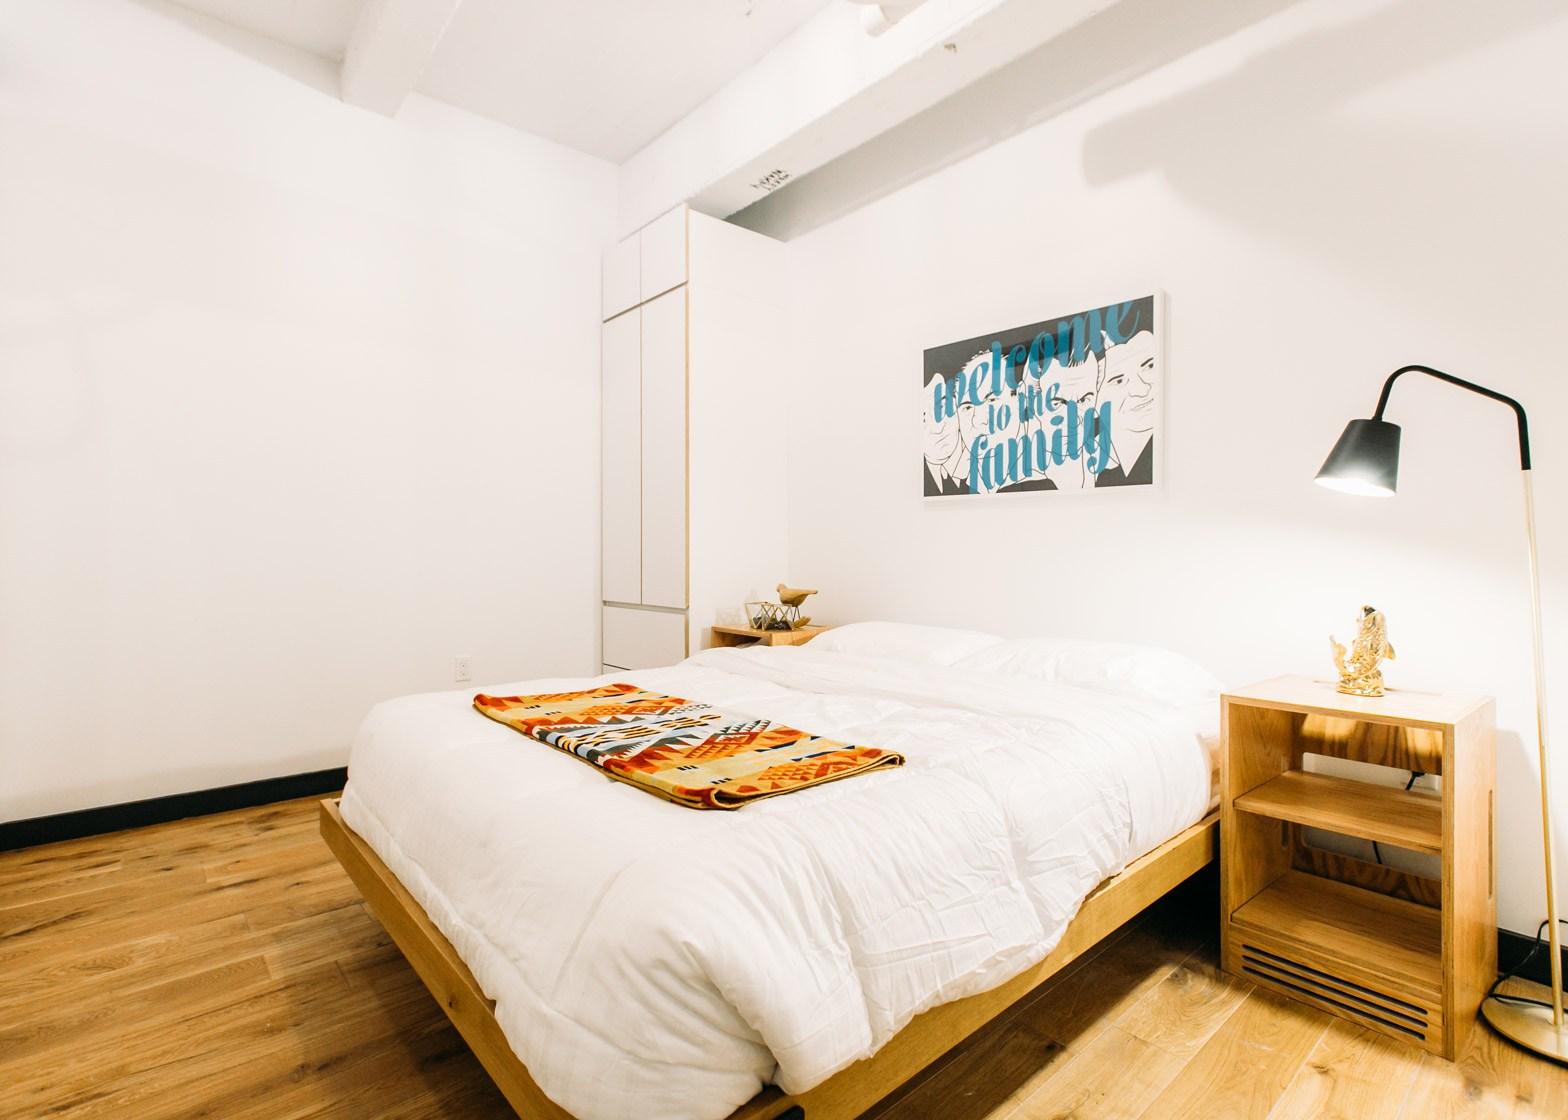 co-living-apartments-welive-new-york-city-usa_dezeen_1568_8.jpg